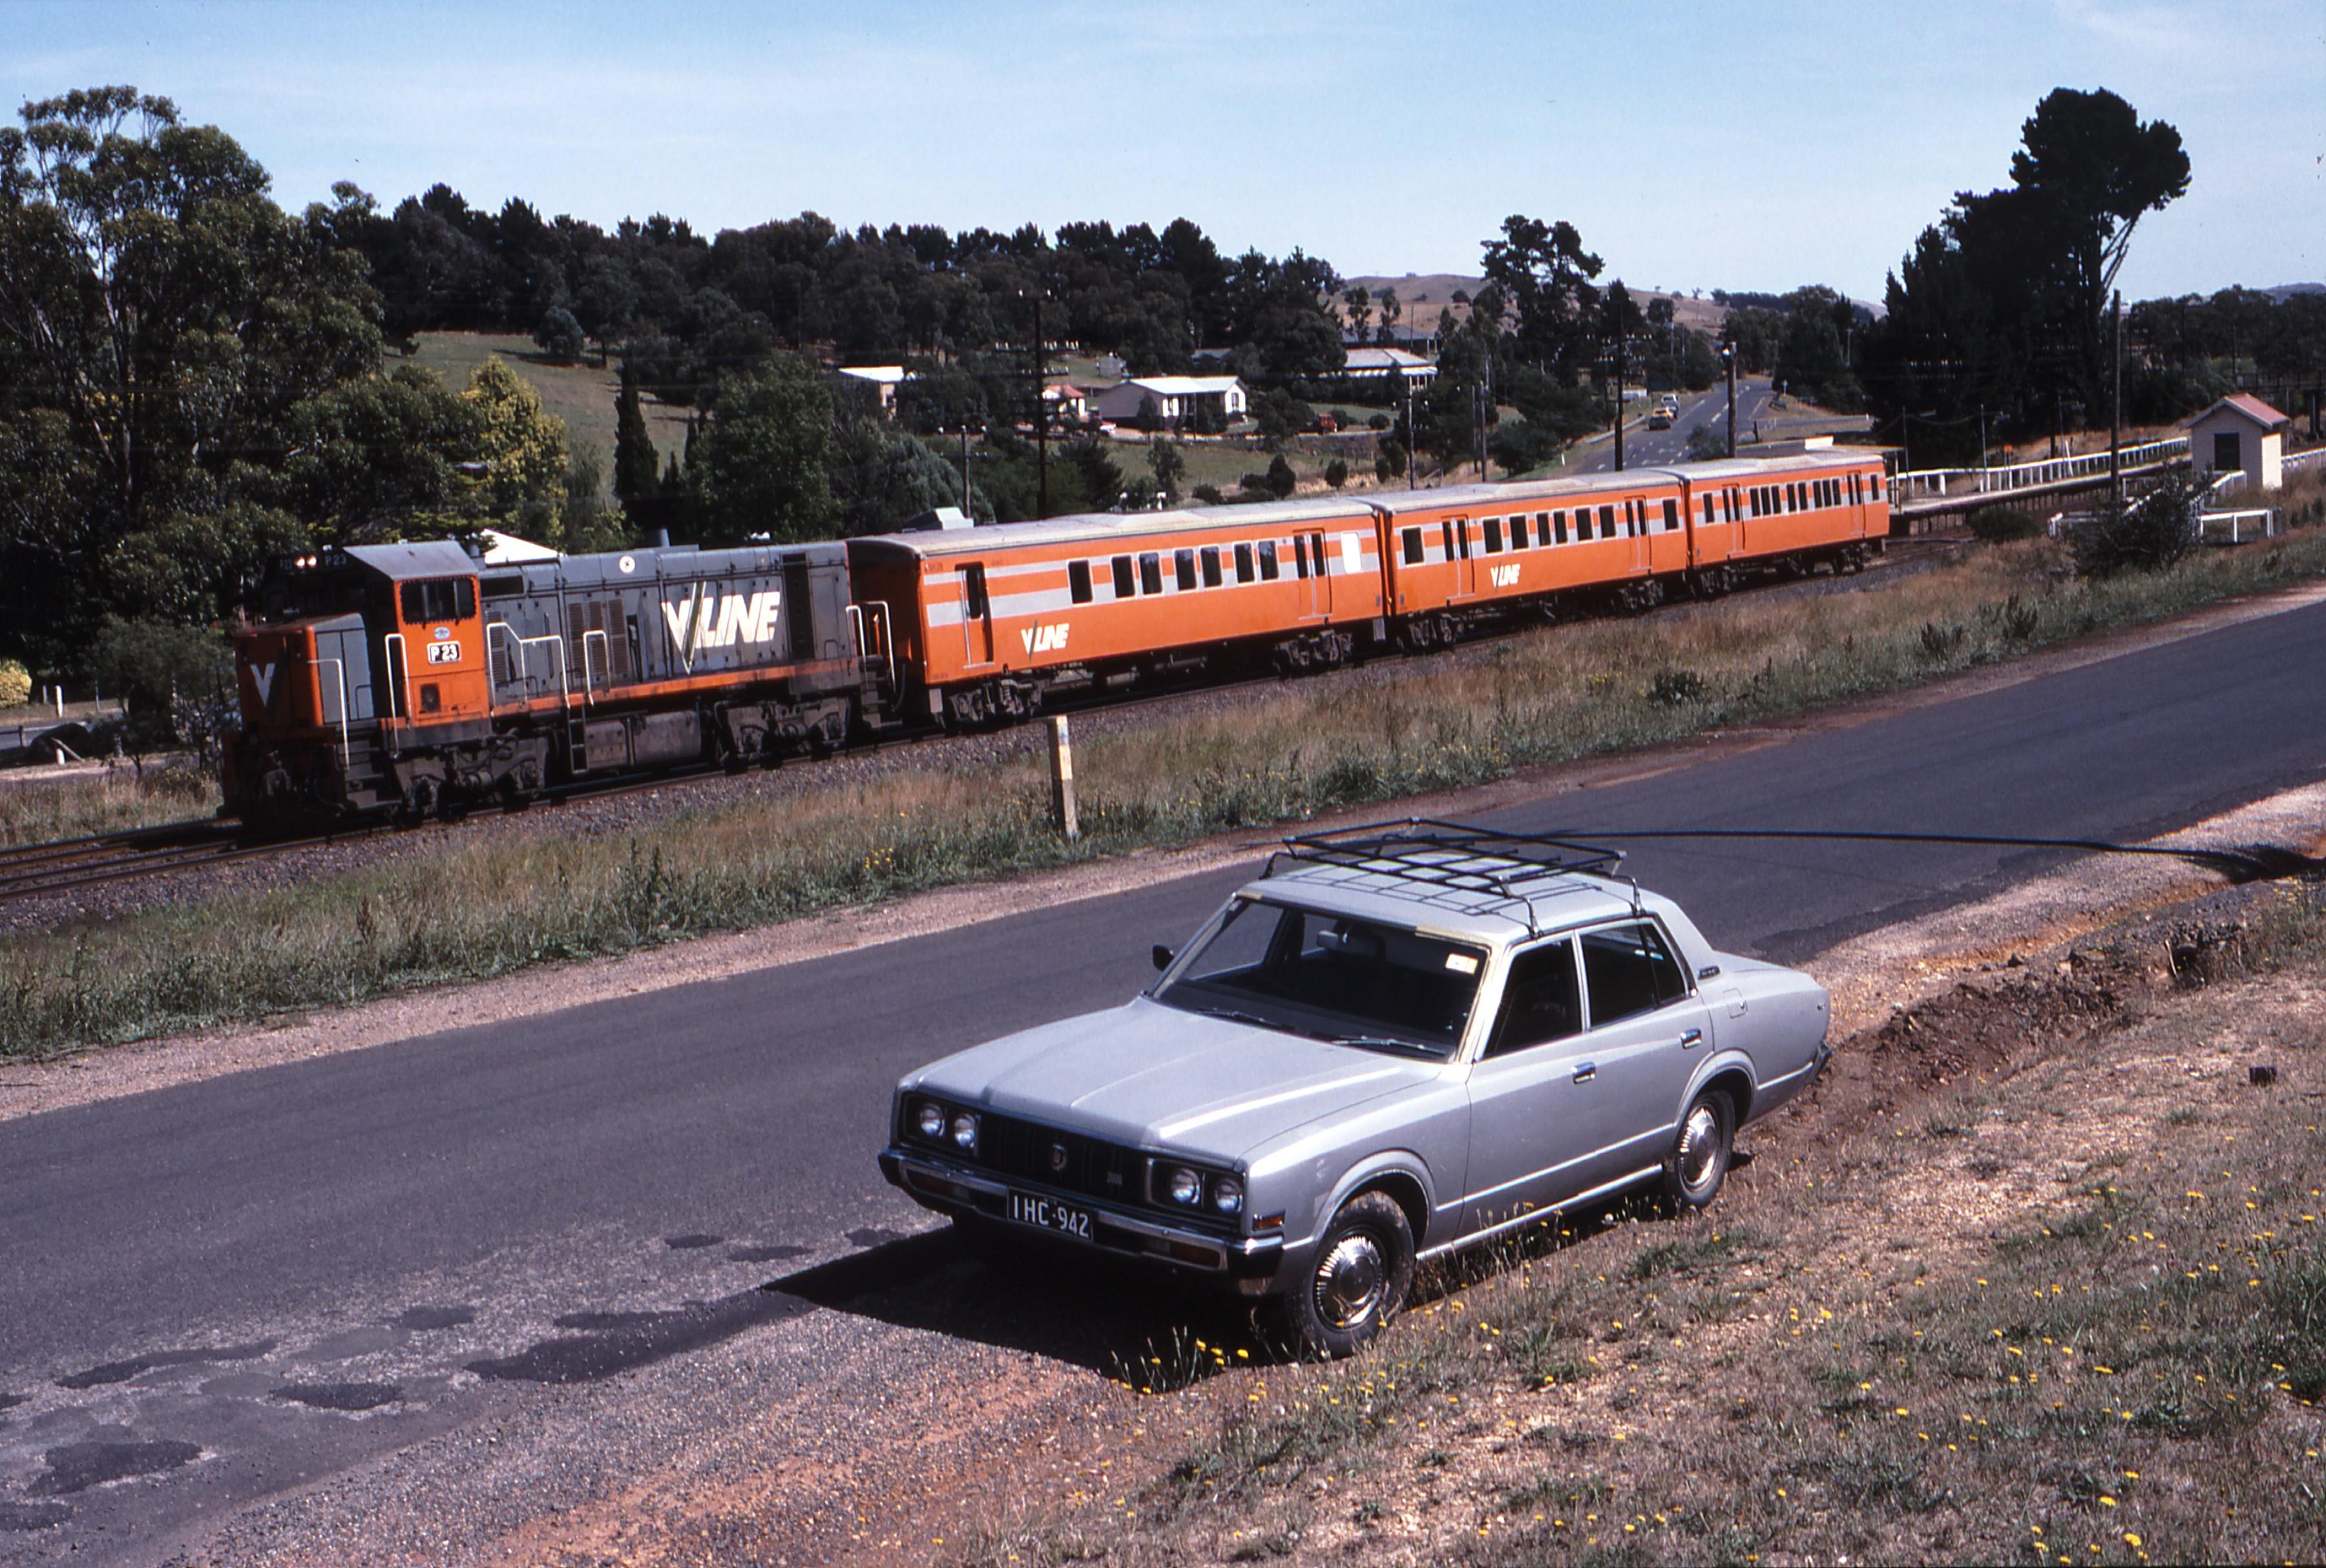 Toyota Of Weston >> Weston Langford - 116354: Wandong 8314 Up Passenger from Seymour P 23 Langfords 1975 Model ...